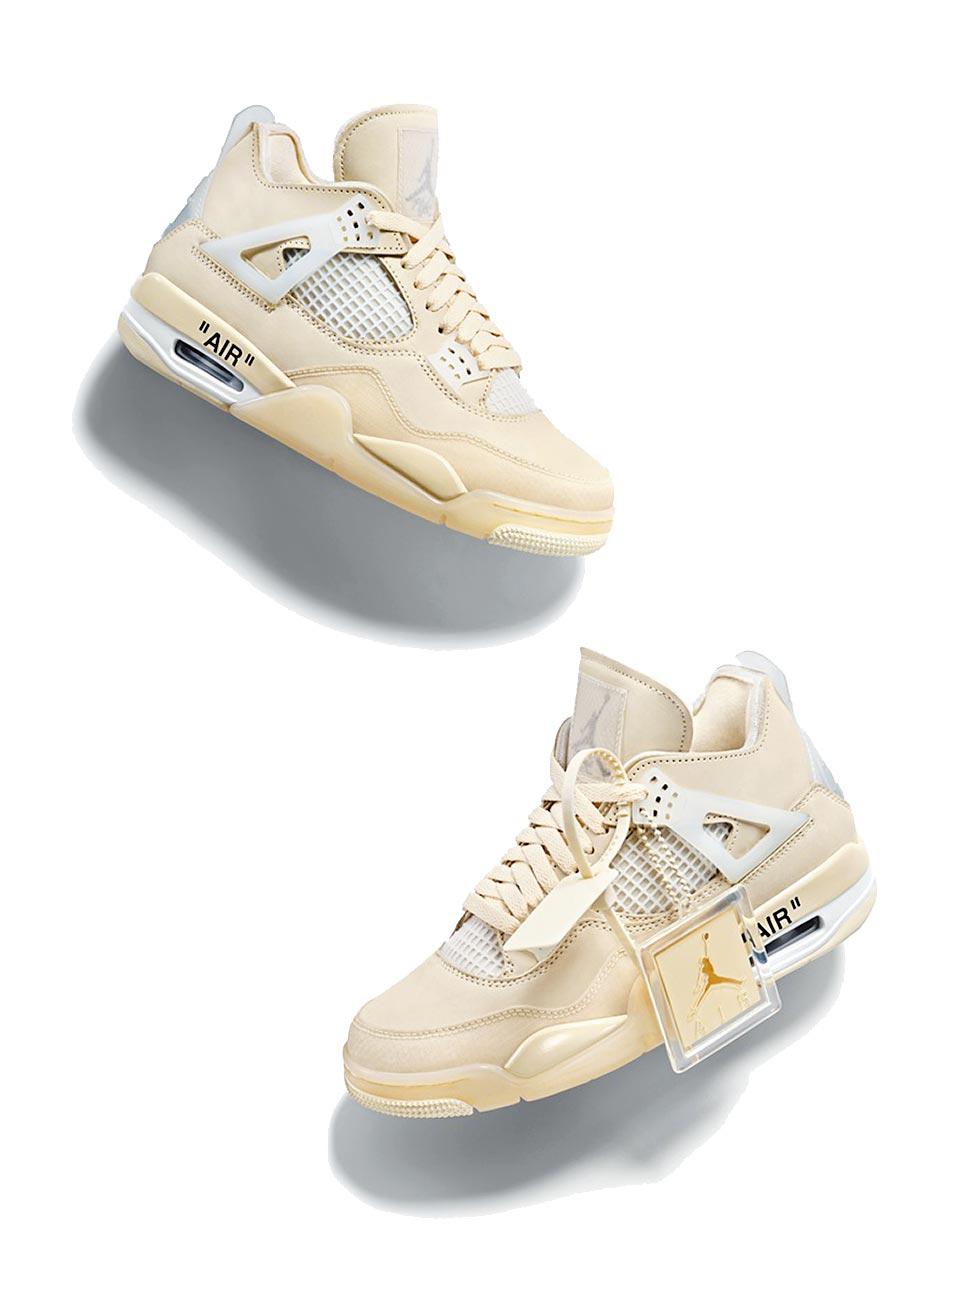 Jordan Brand推出Air Jordan 4 Off-White女子專屬鞋款,於今(25)日開賣,定價7200元。(Nike提供)